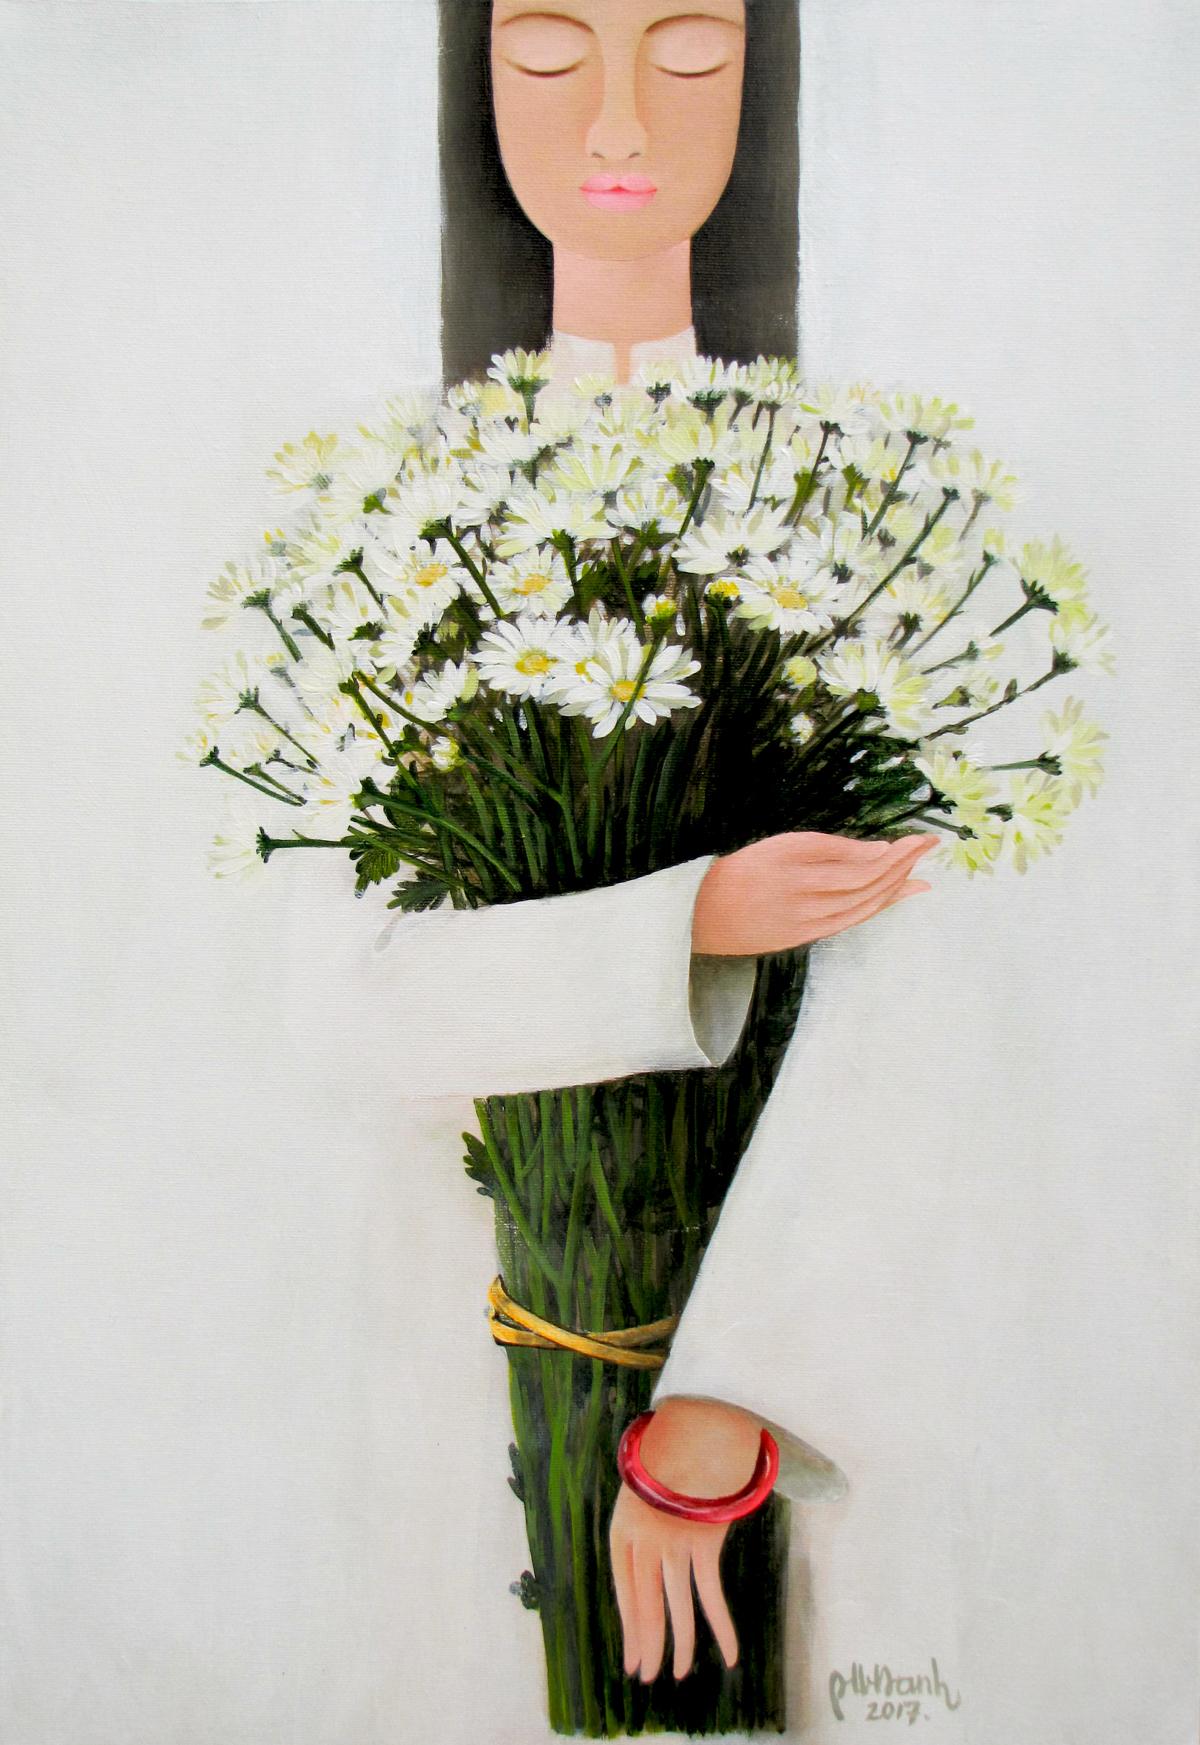 Lady with Daisy flowers-45x65cm